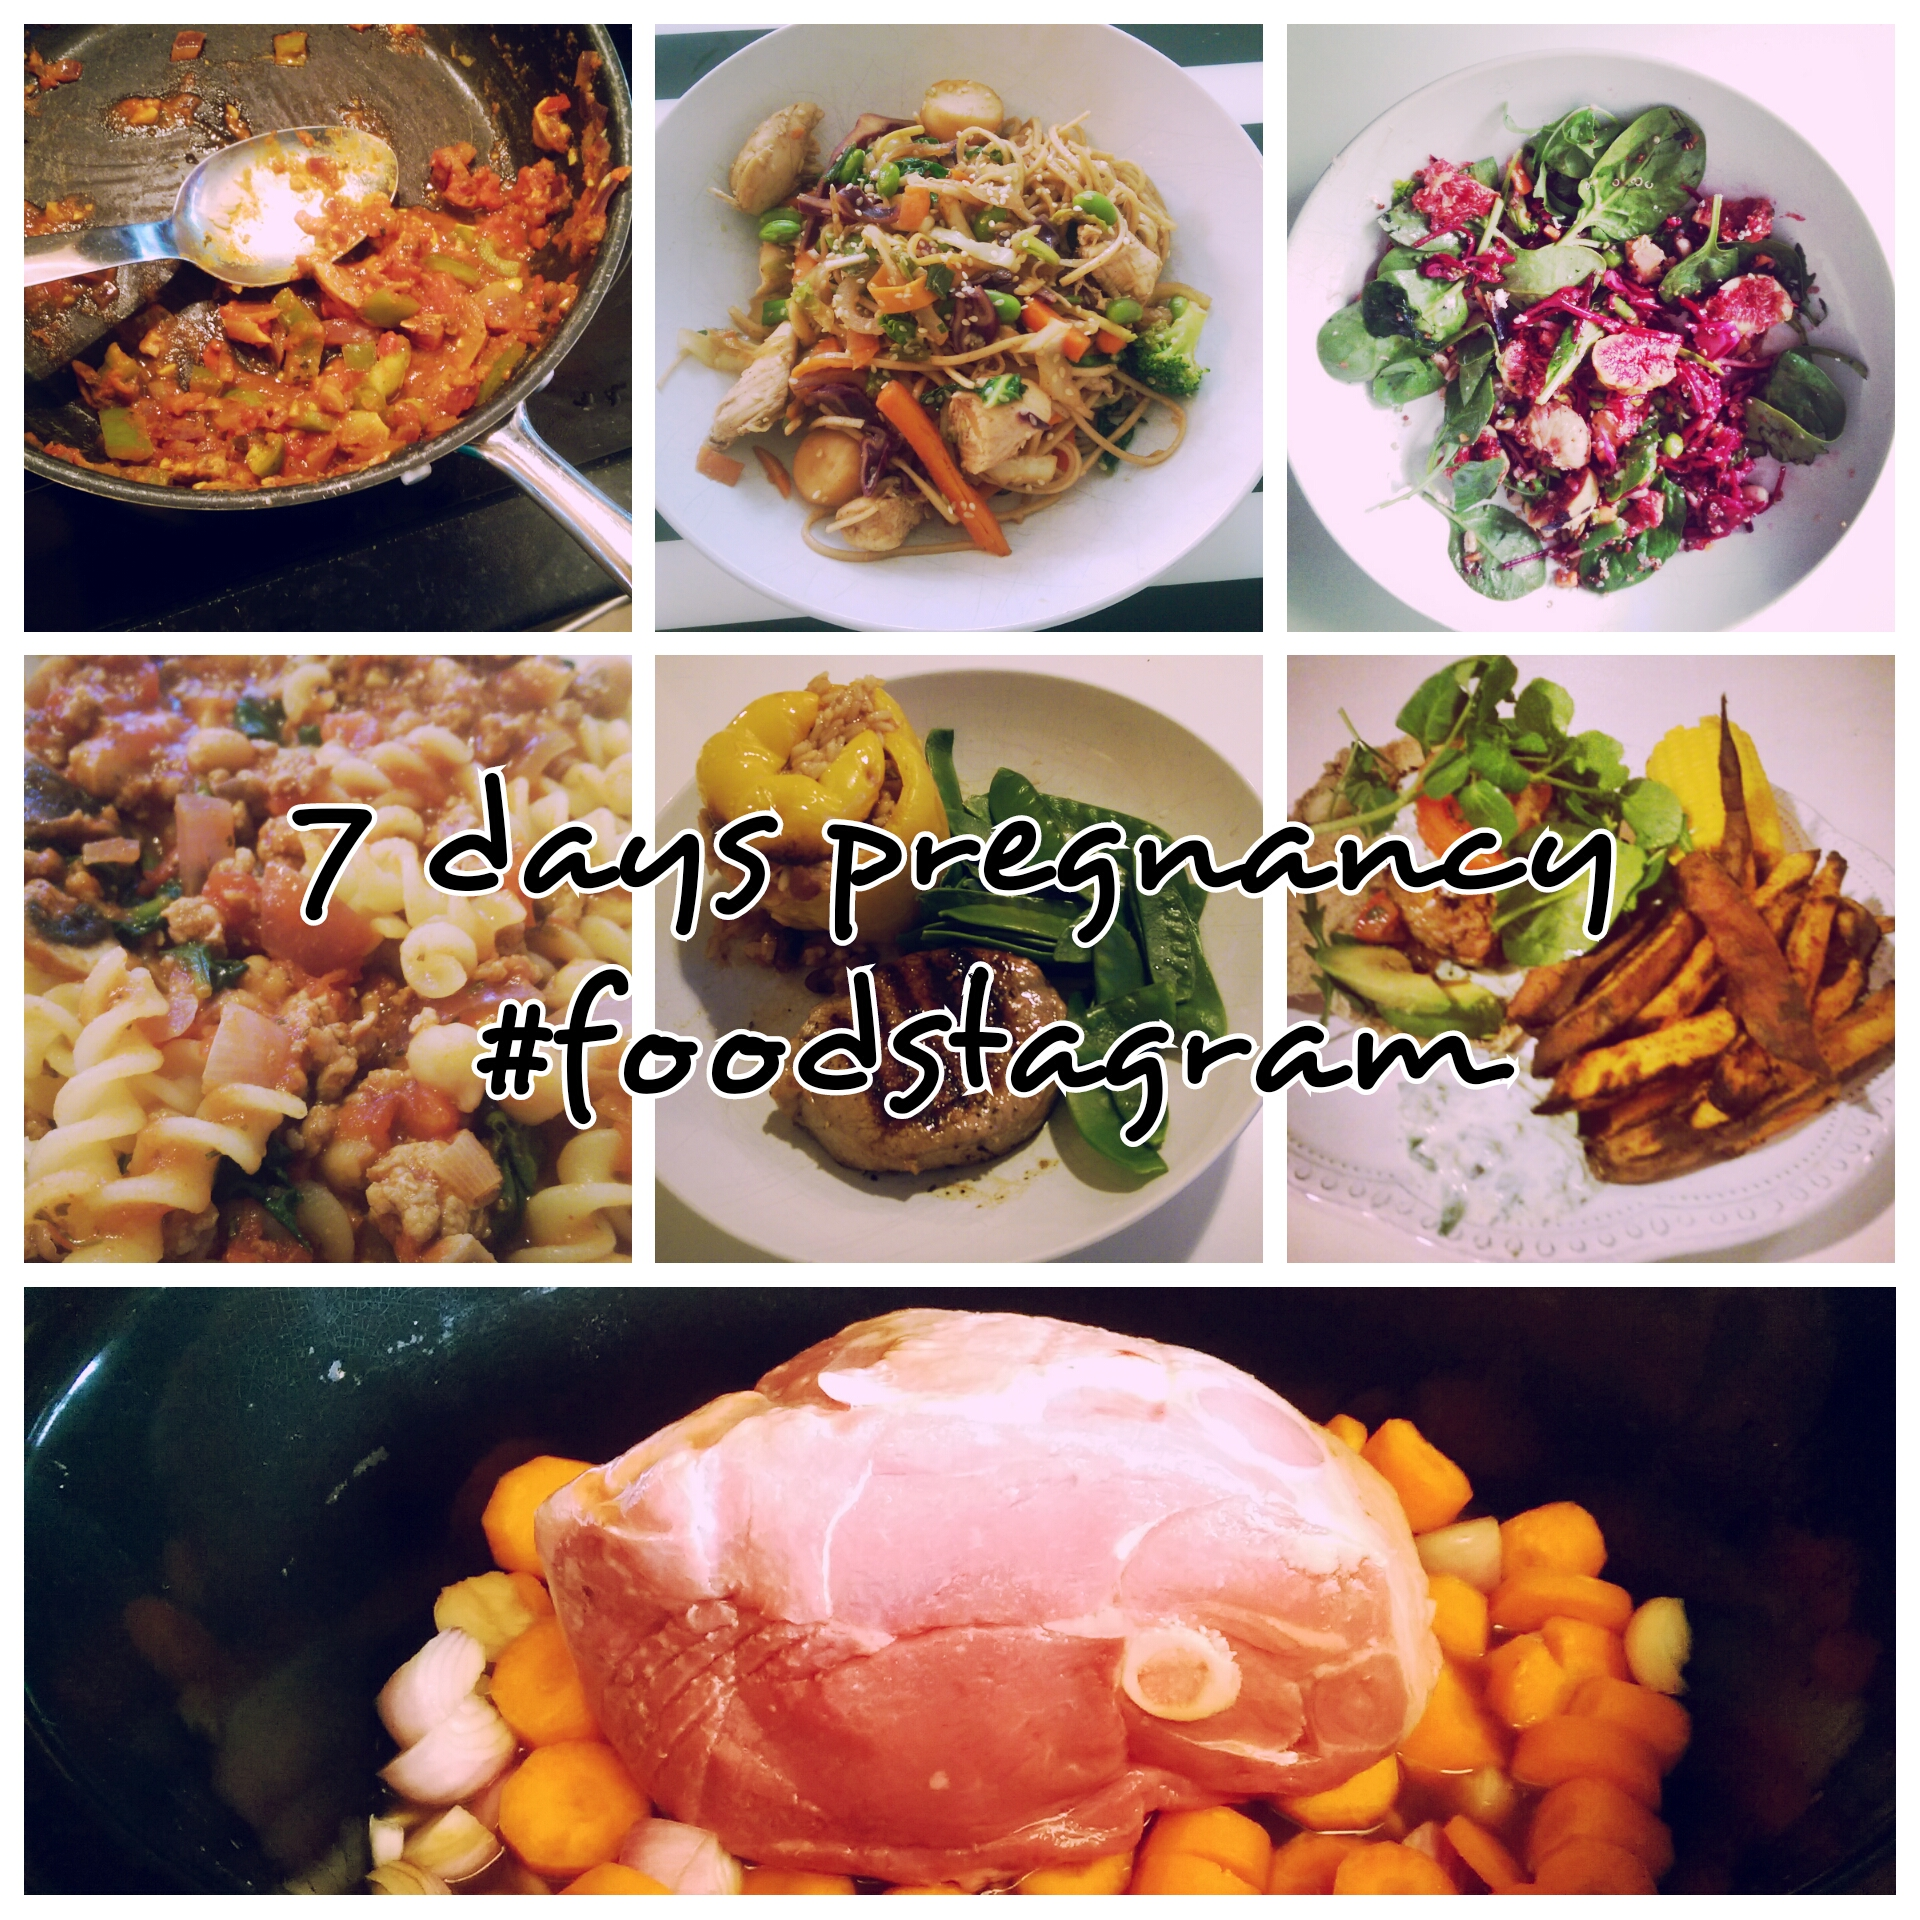 7 days pregnancy #foodstagram